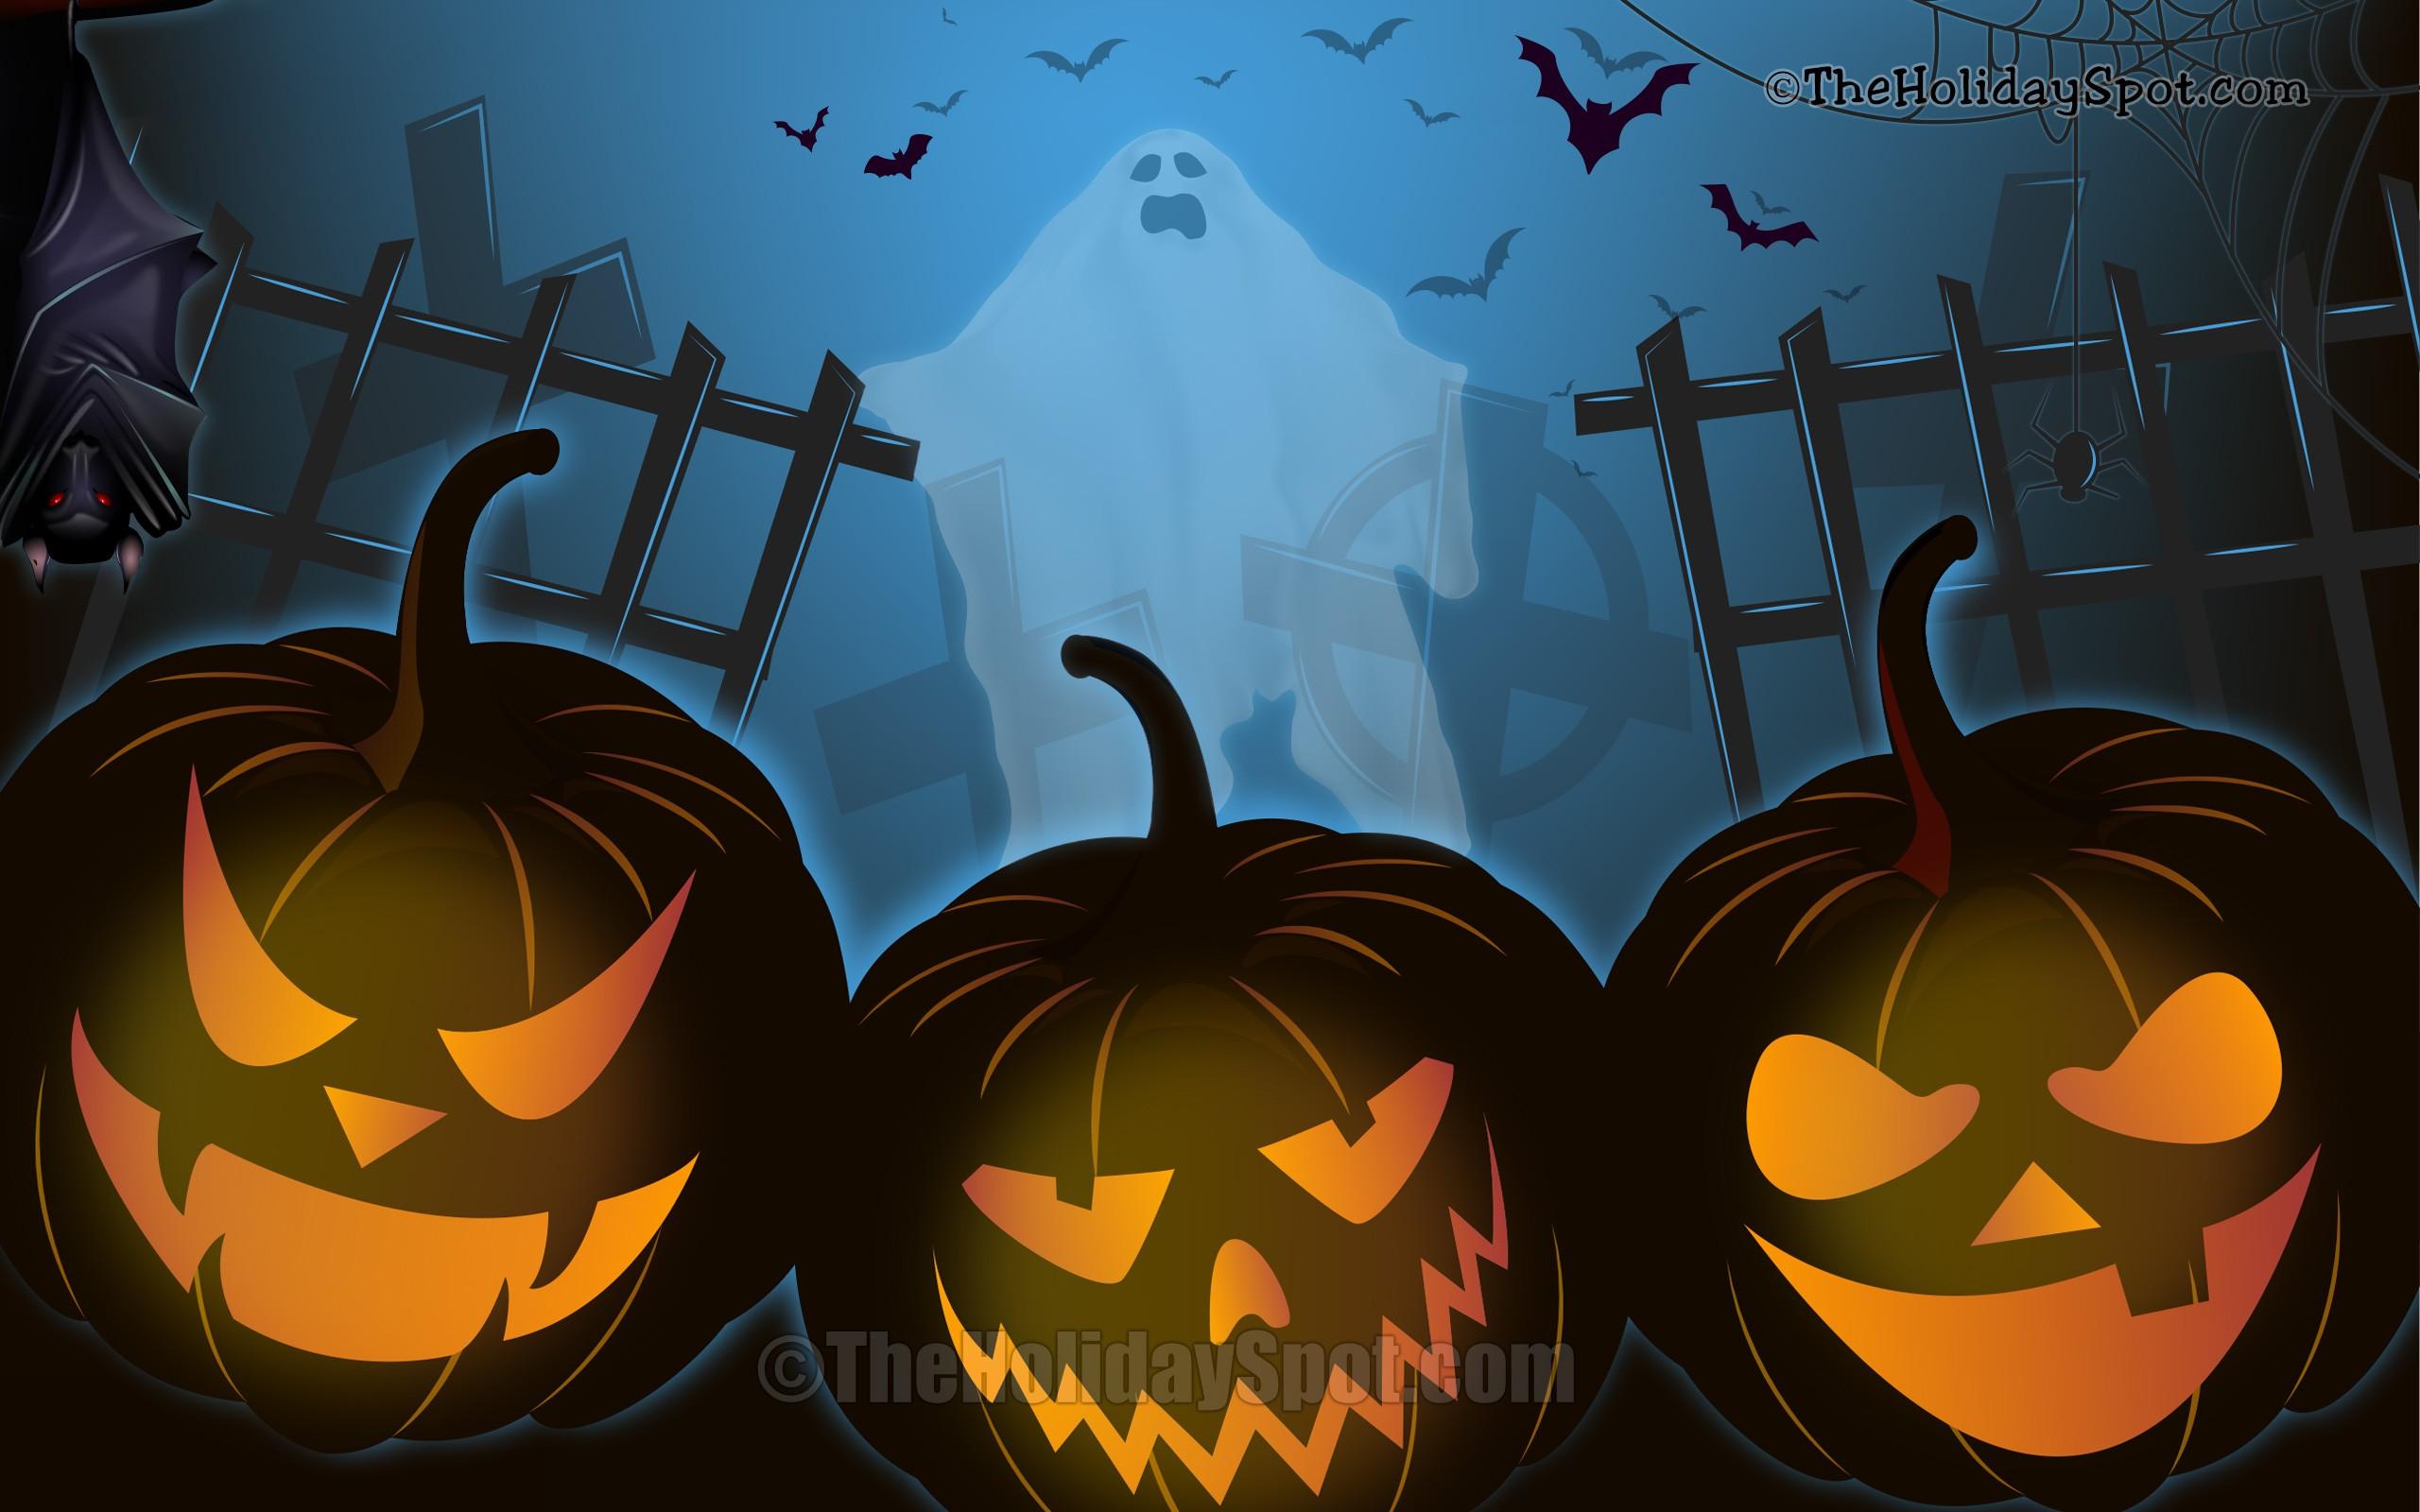 Halloween Wallpaper Download Free Beautiful High Wallpapers Of